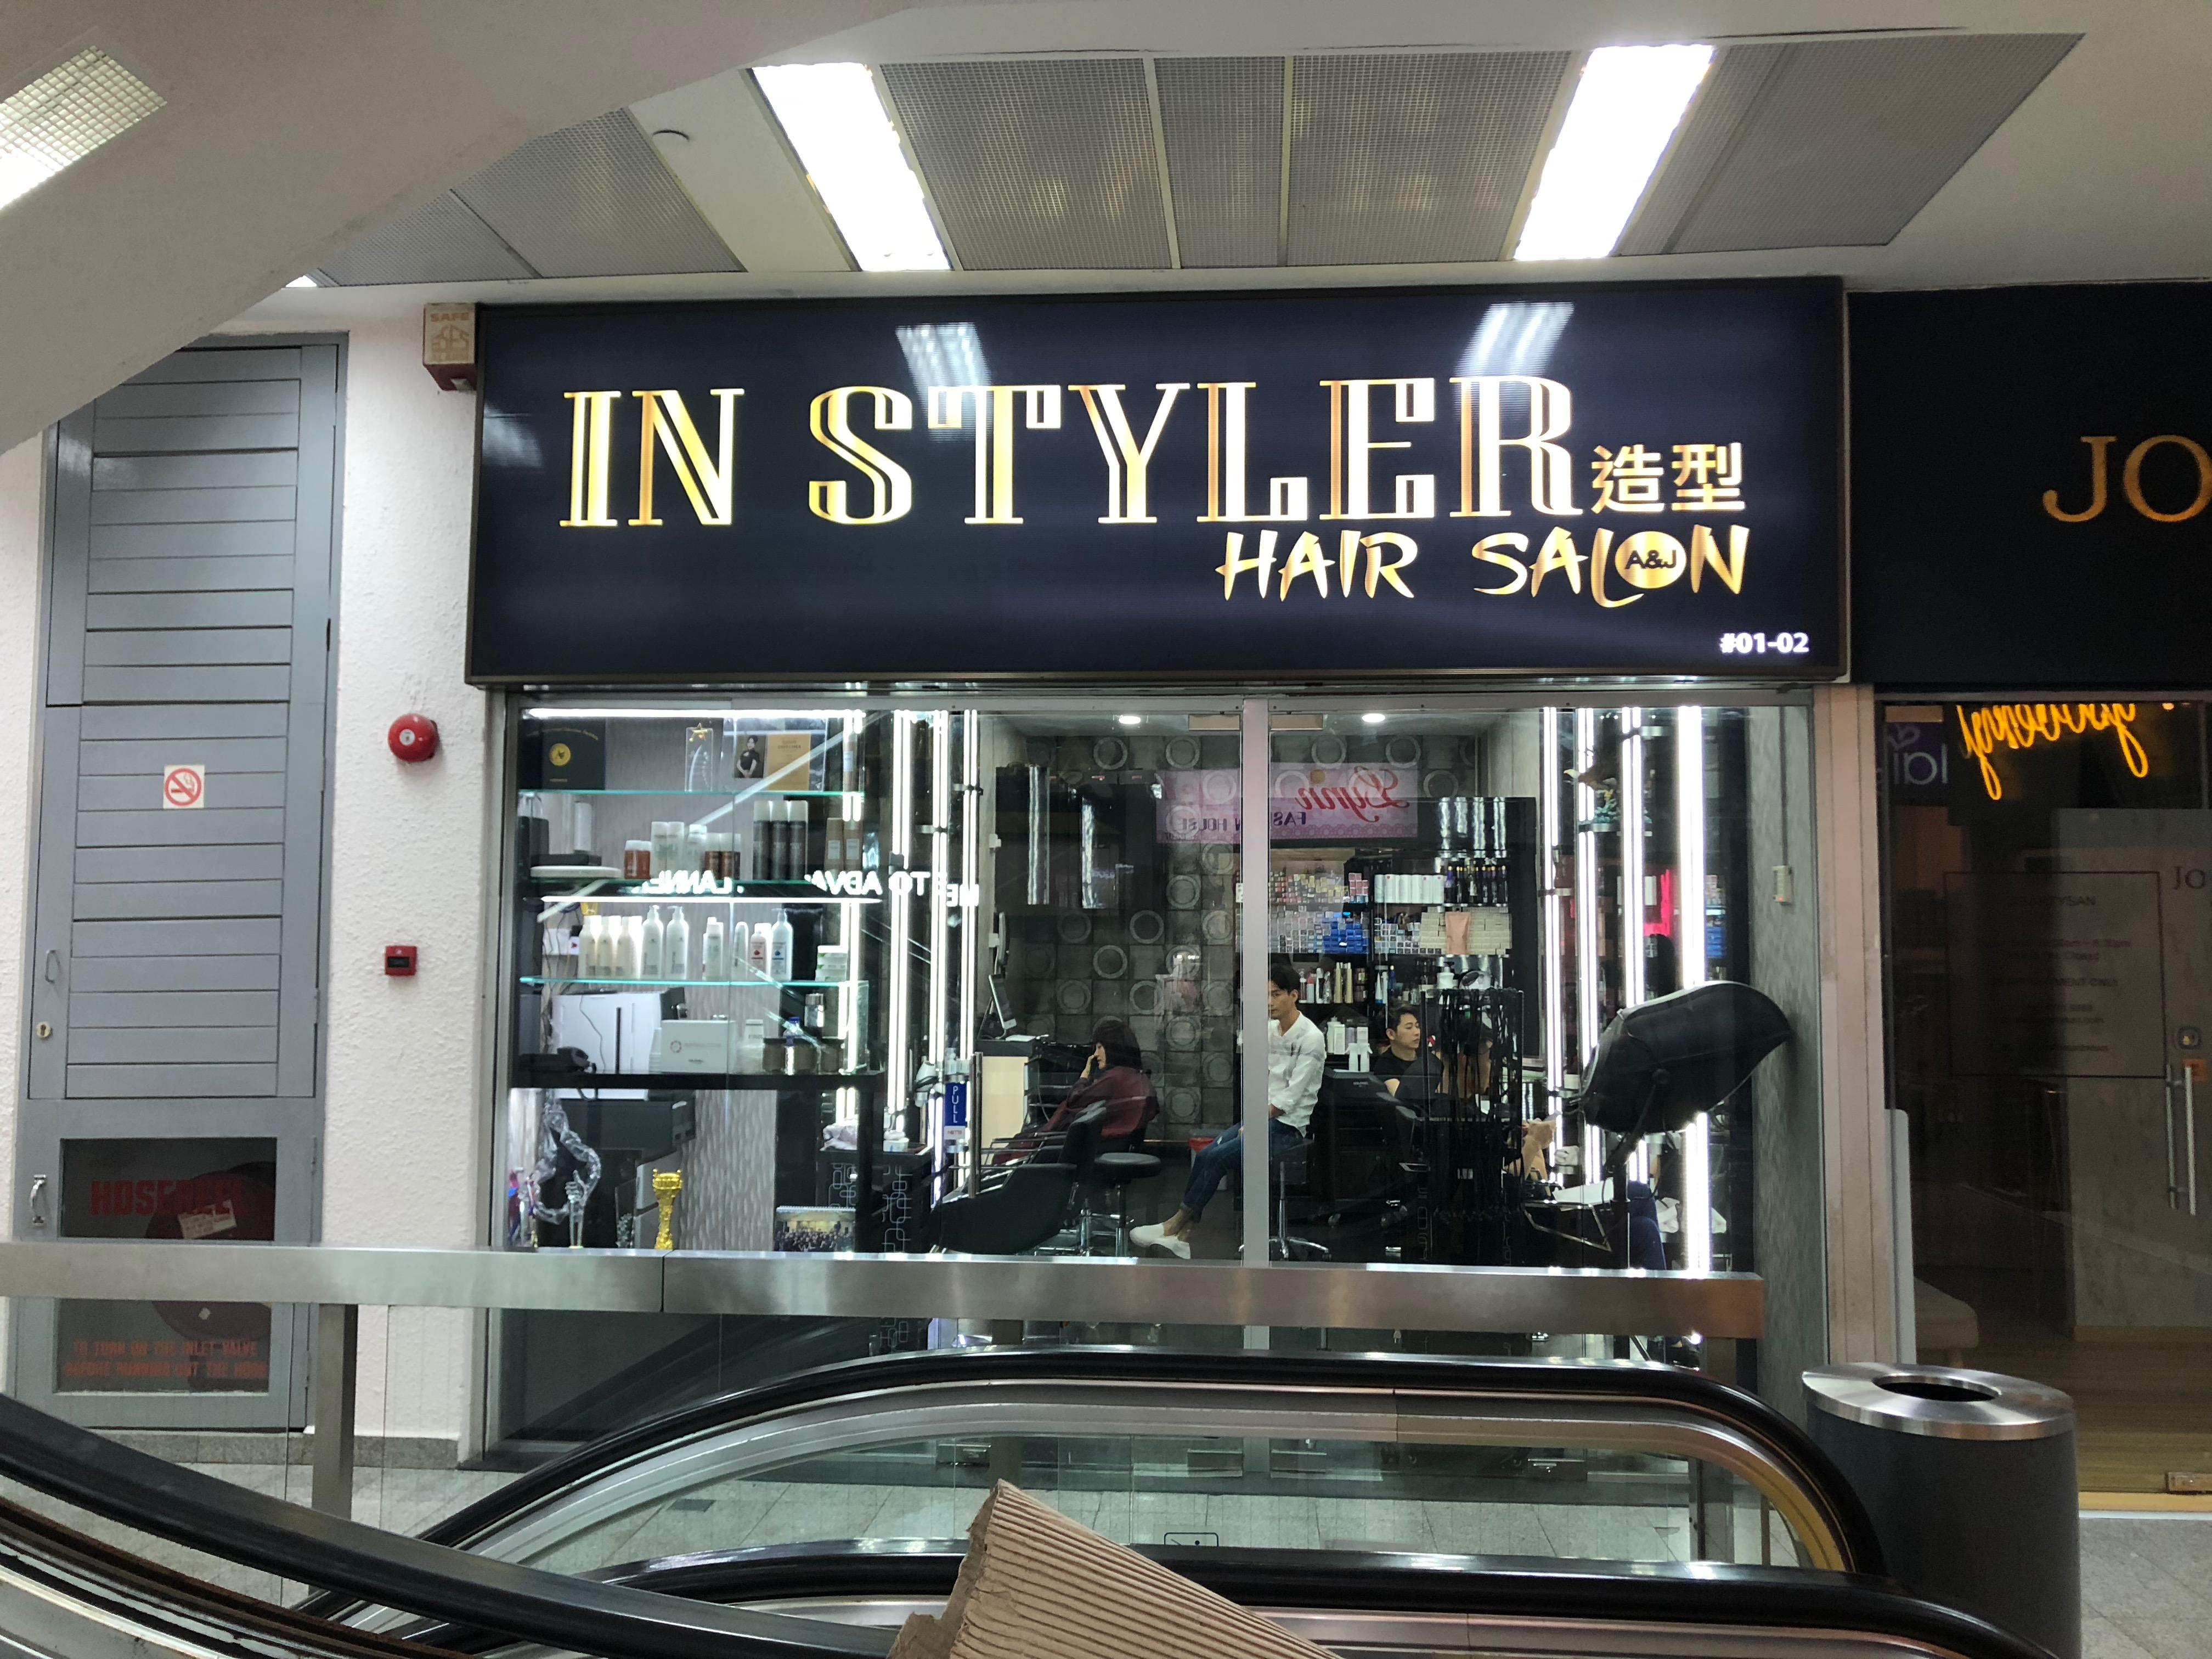 The exterior of a hair salon.